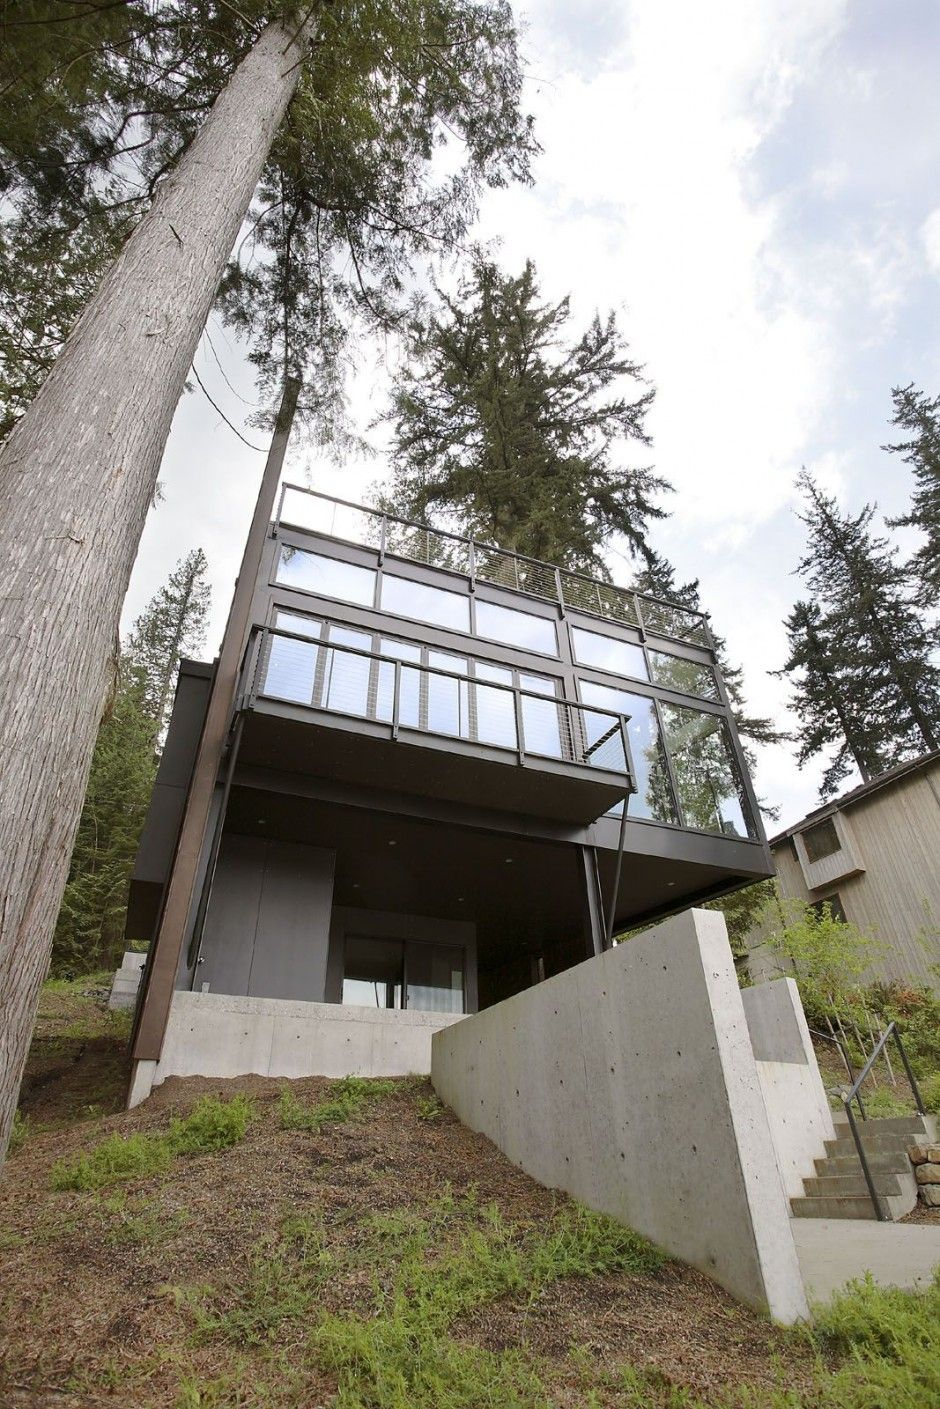 house david vandervort - Buscar con Google